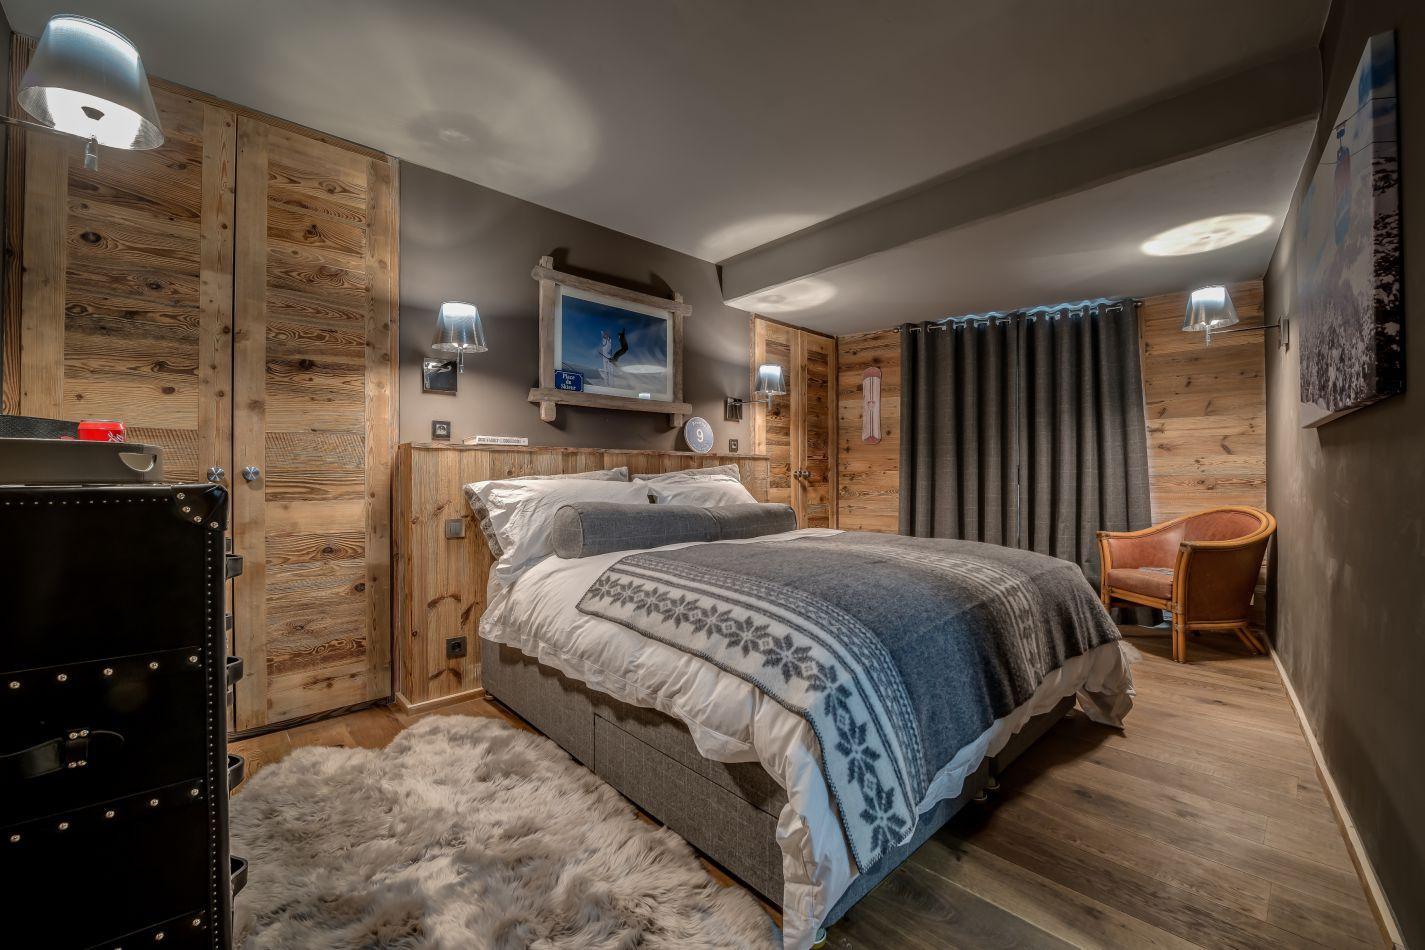 jejalp-bedroom-3